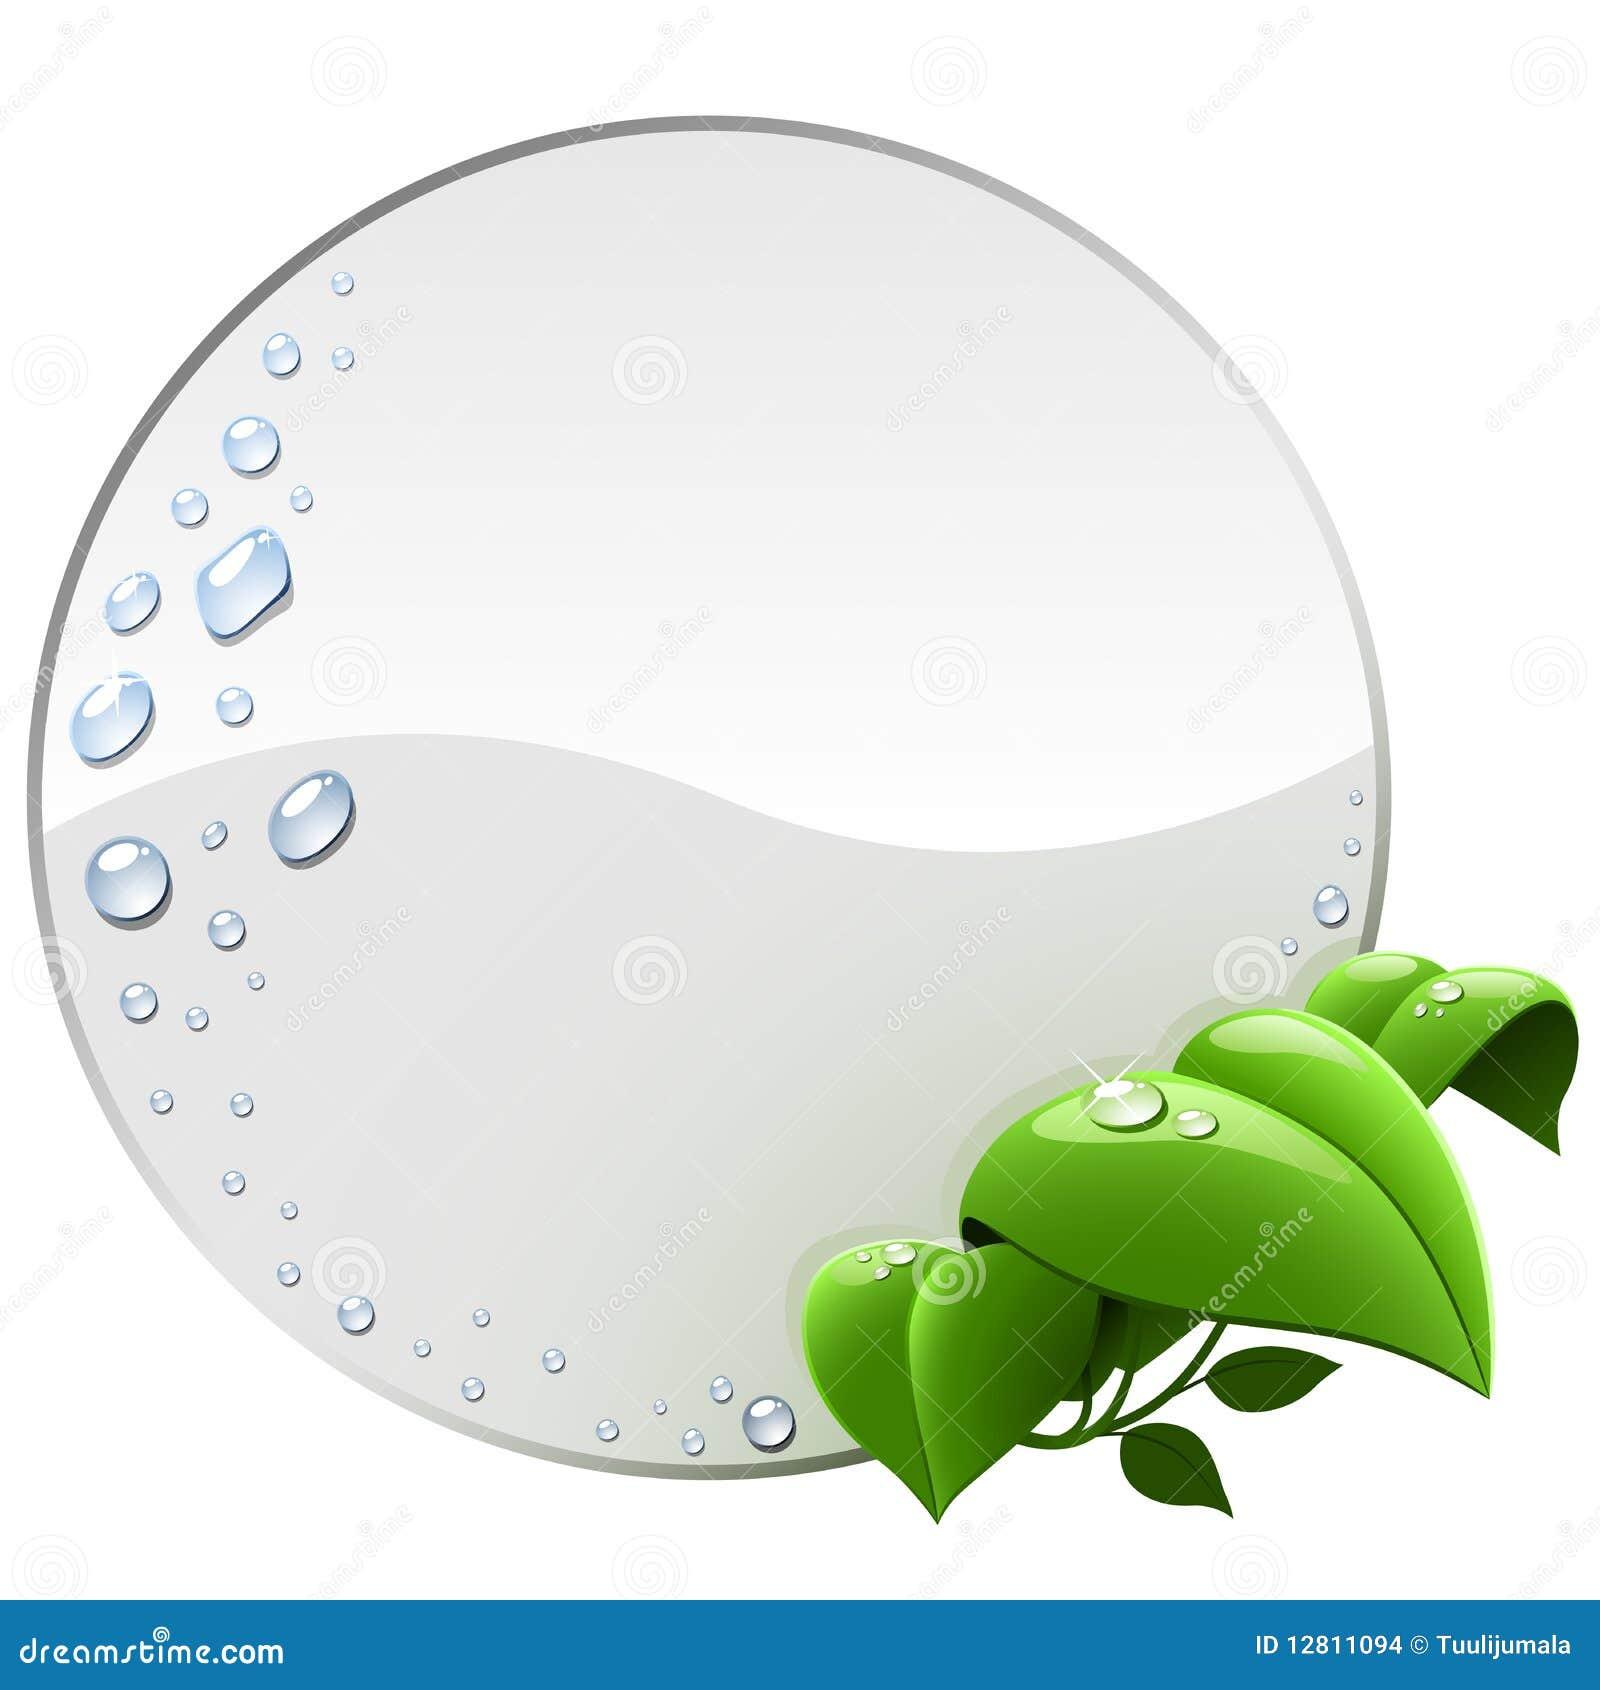 Etiqueta ambiental em branco